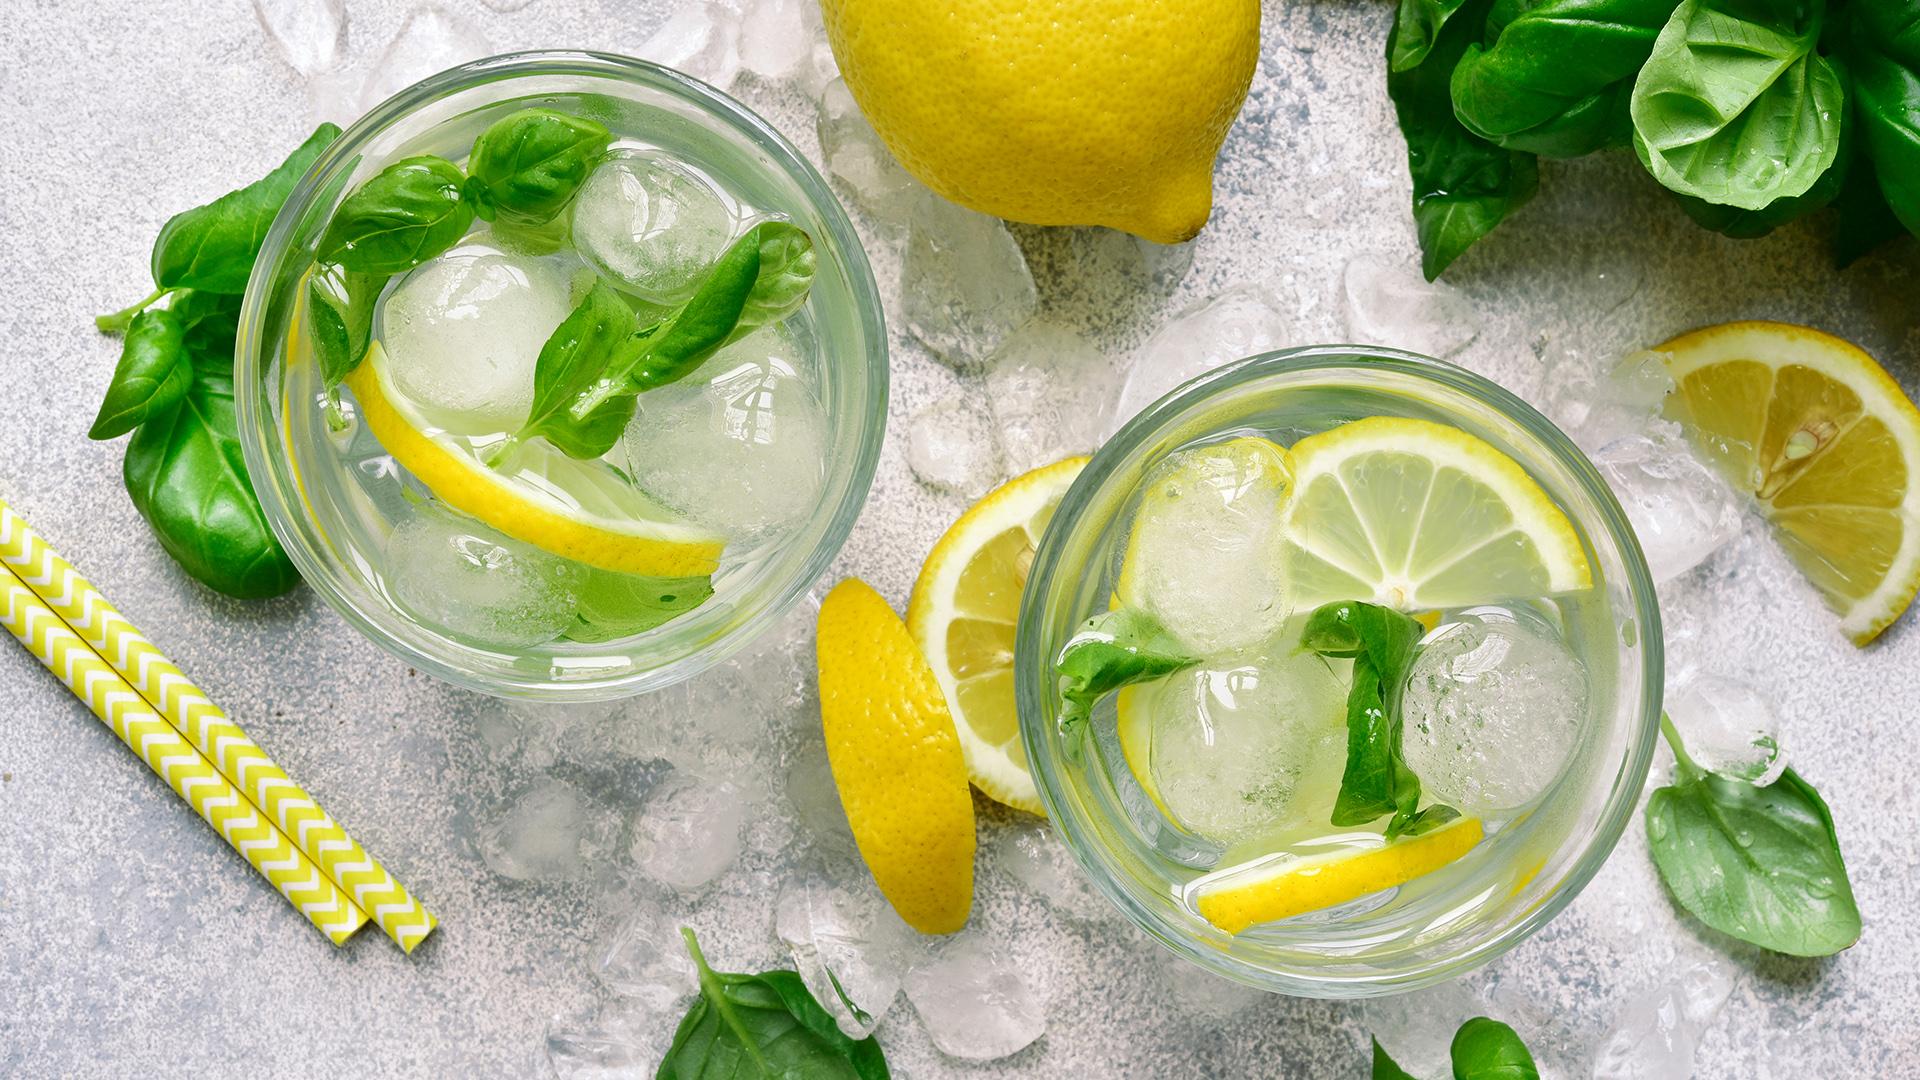 13 Giada De Laurentiis Summer Cocktails & Dishes We'll Be Making All Summer